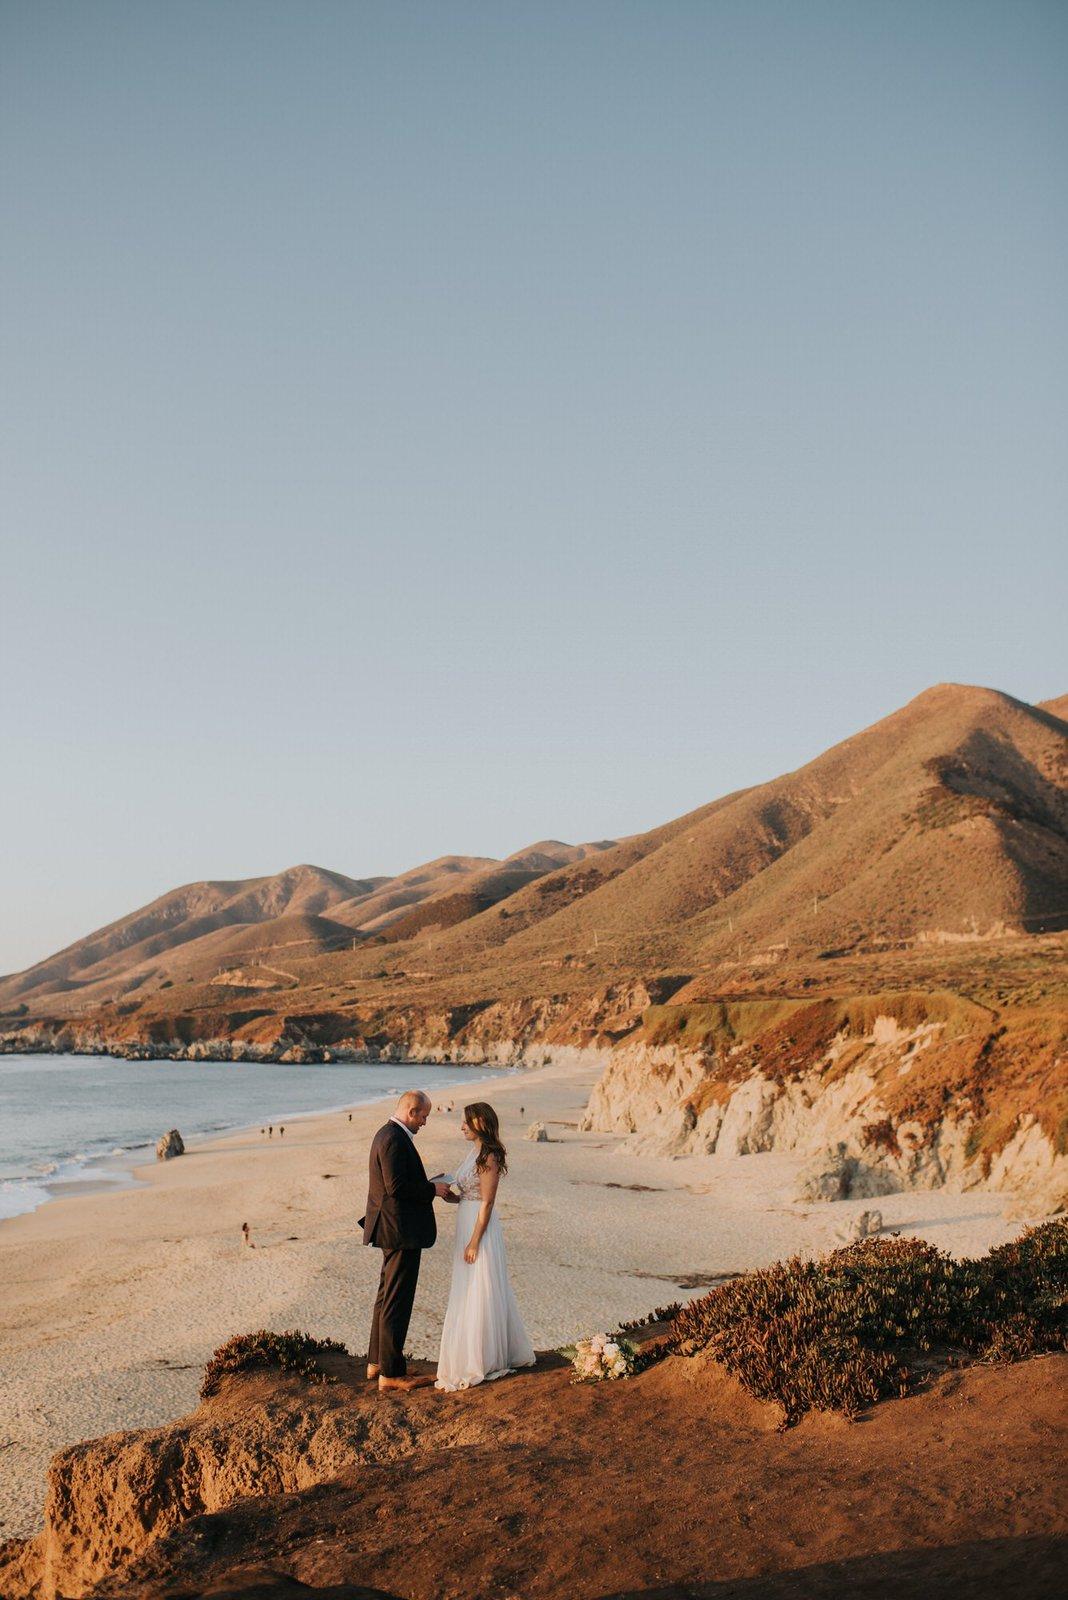 groom exchange vows